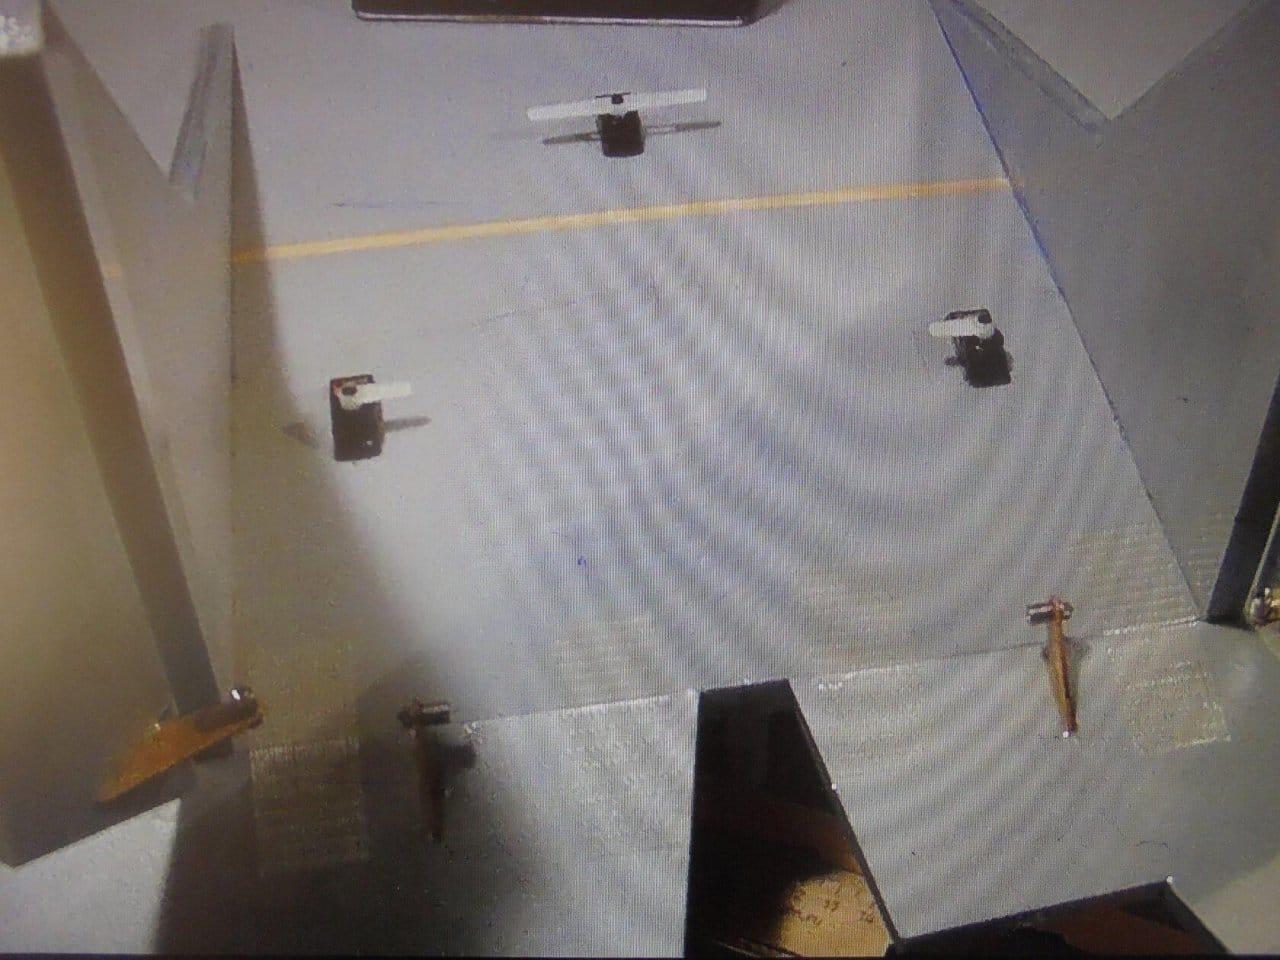 Seaplane STRIZH - Гидросамолет СТРИЖ из подложки под ламинат